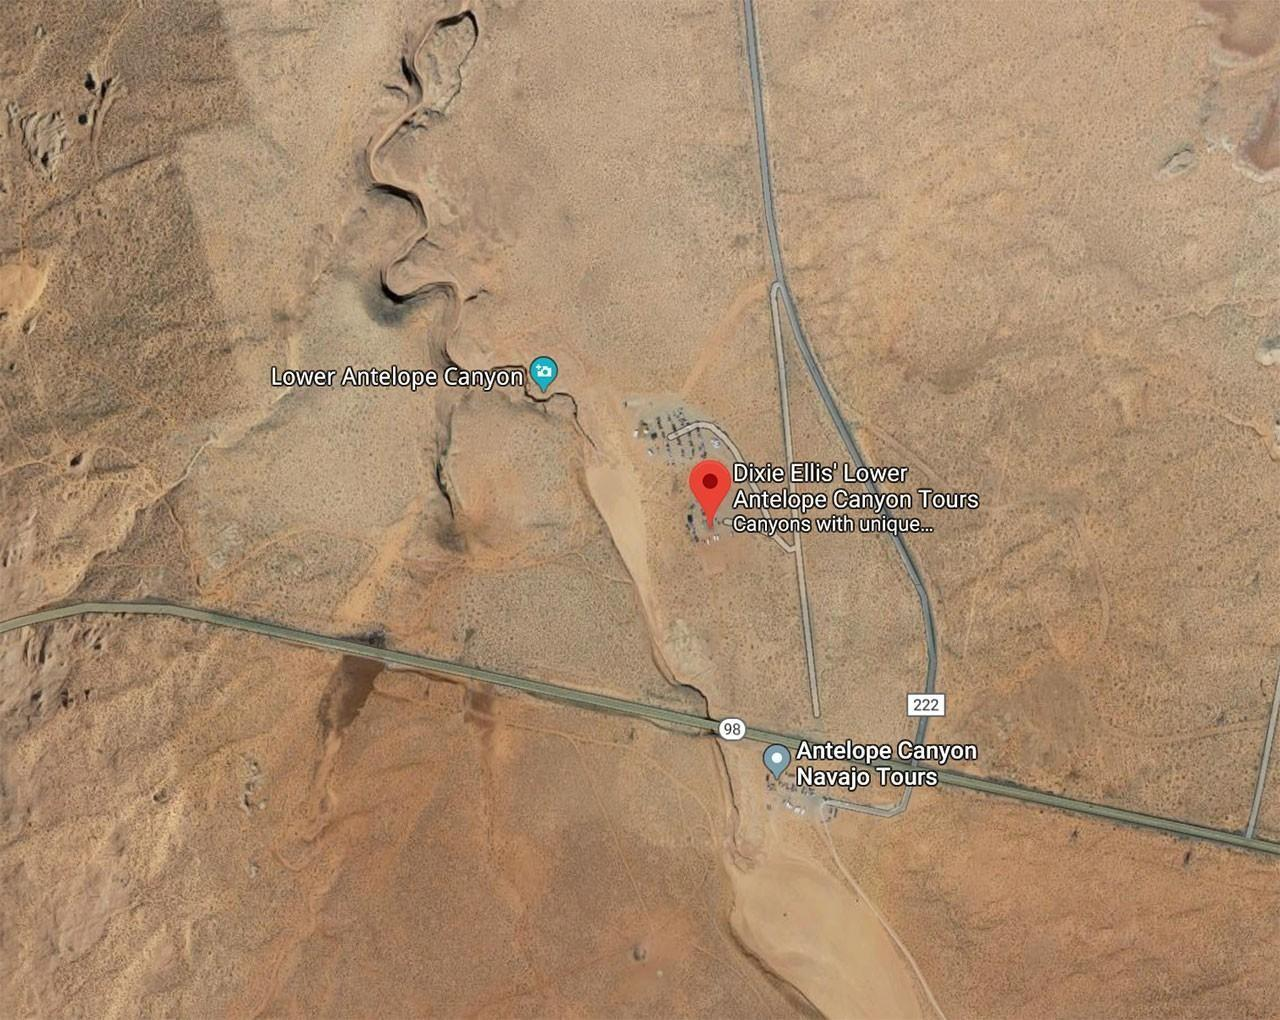 Map of Lower Antelope Canyon